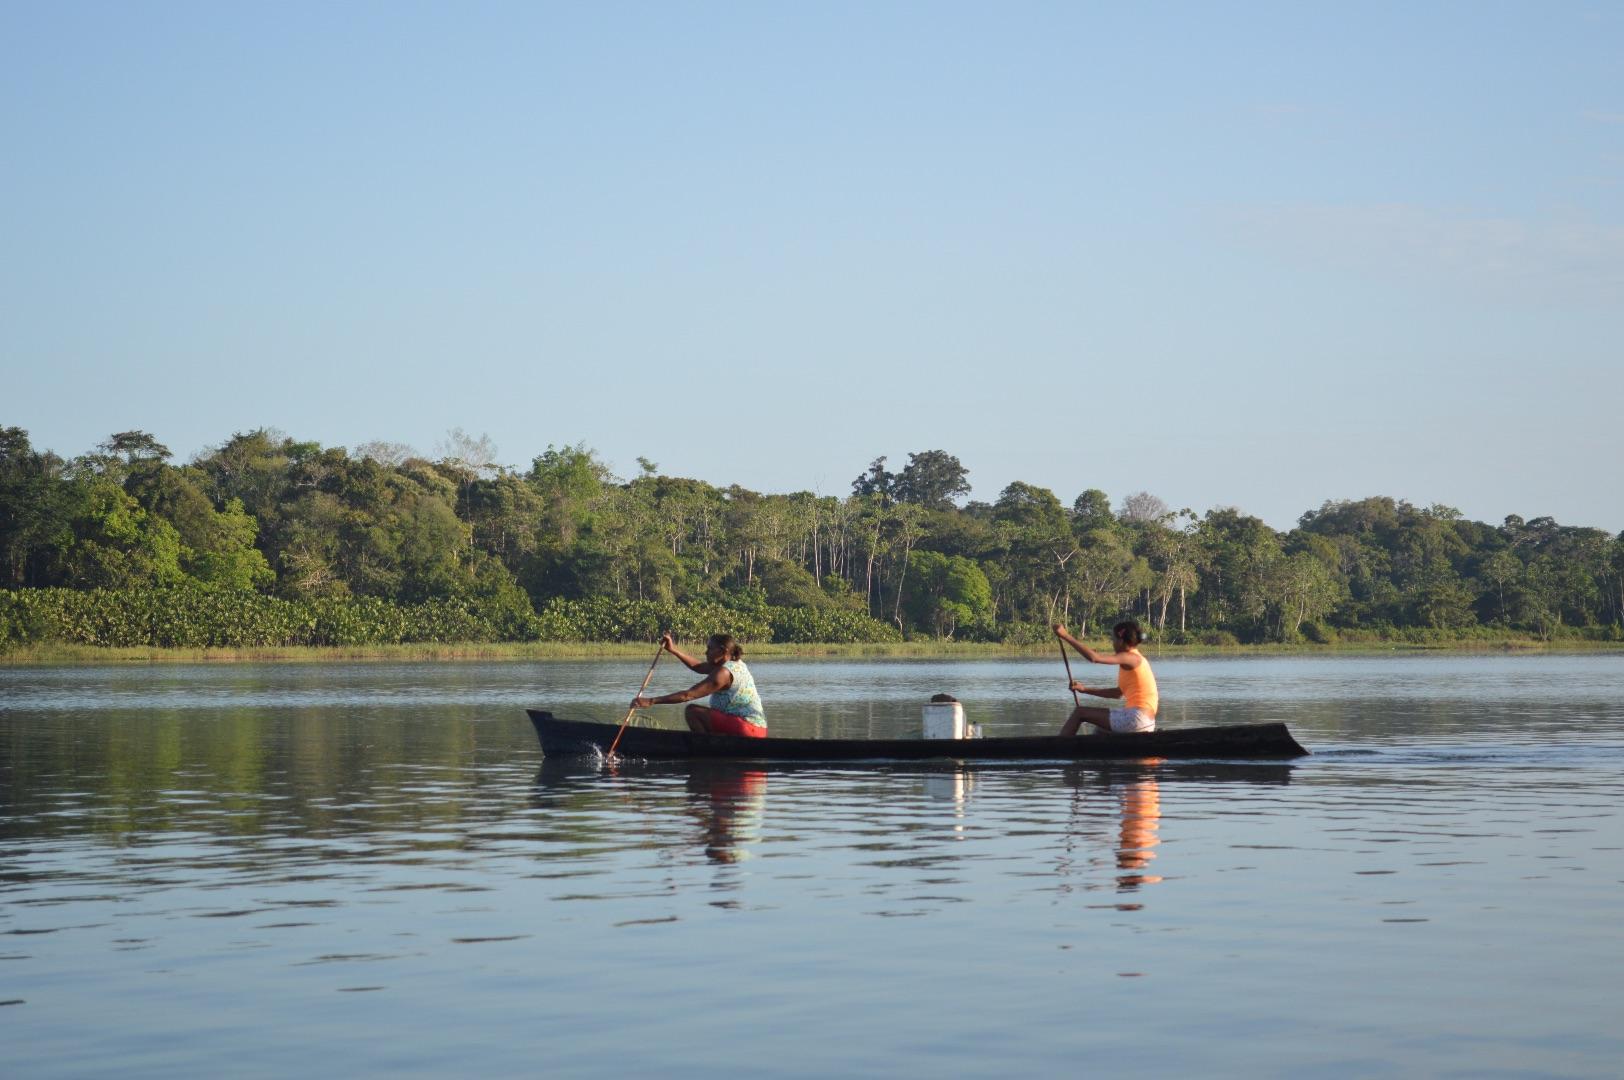 Fishing community in the Brazilian Amazon. Photo: Laura Castro-Diaz